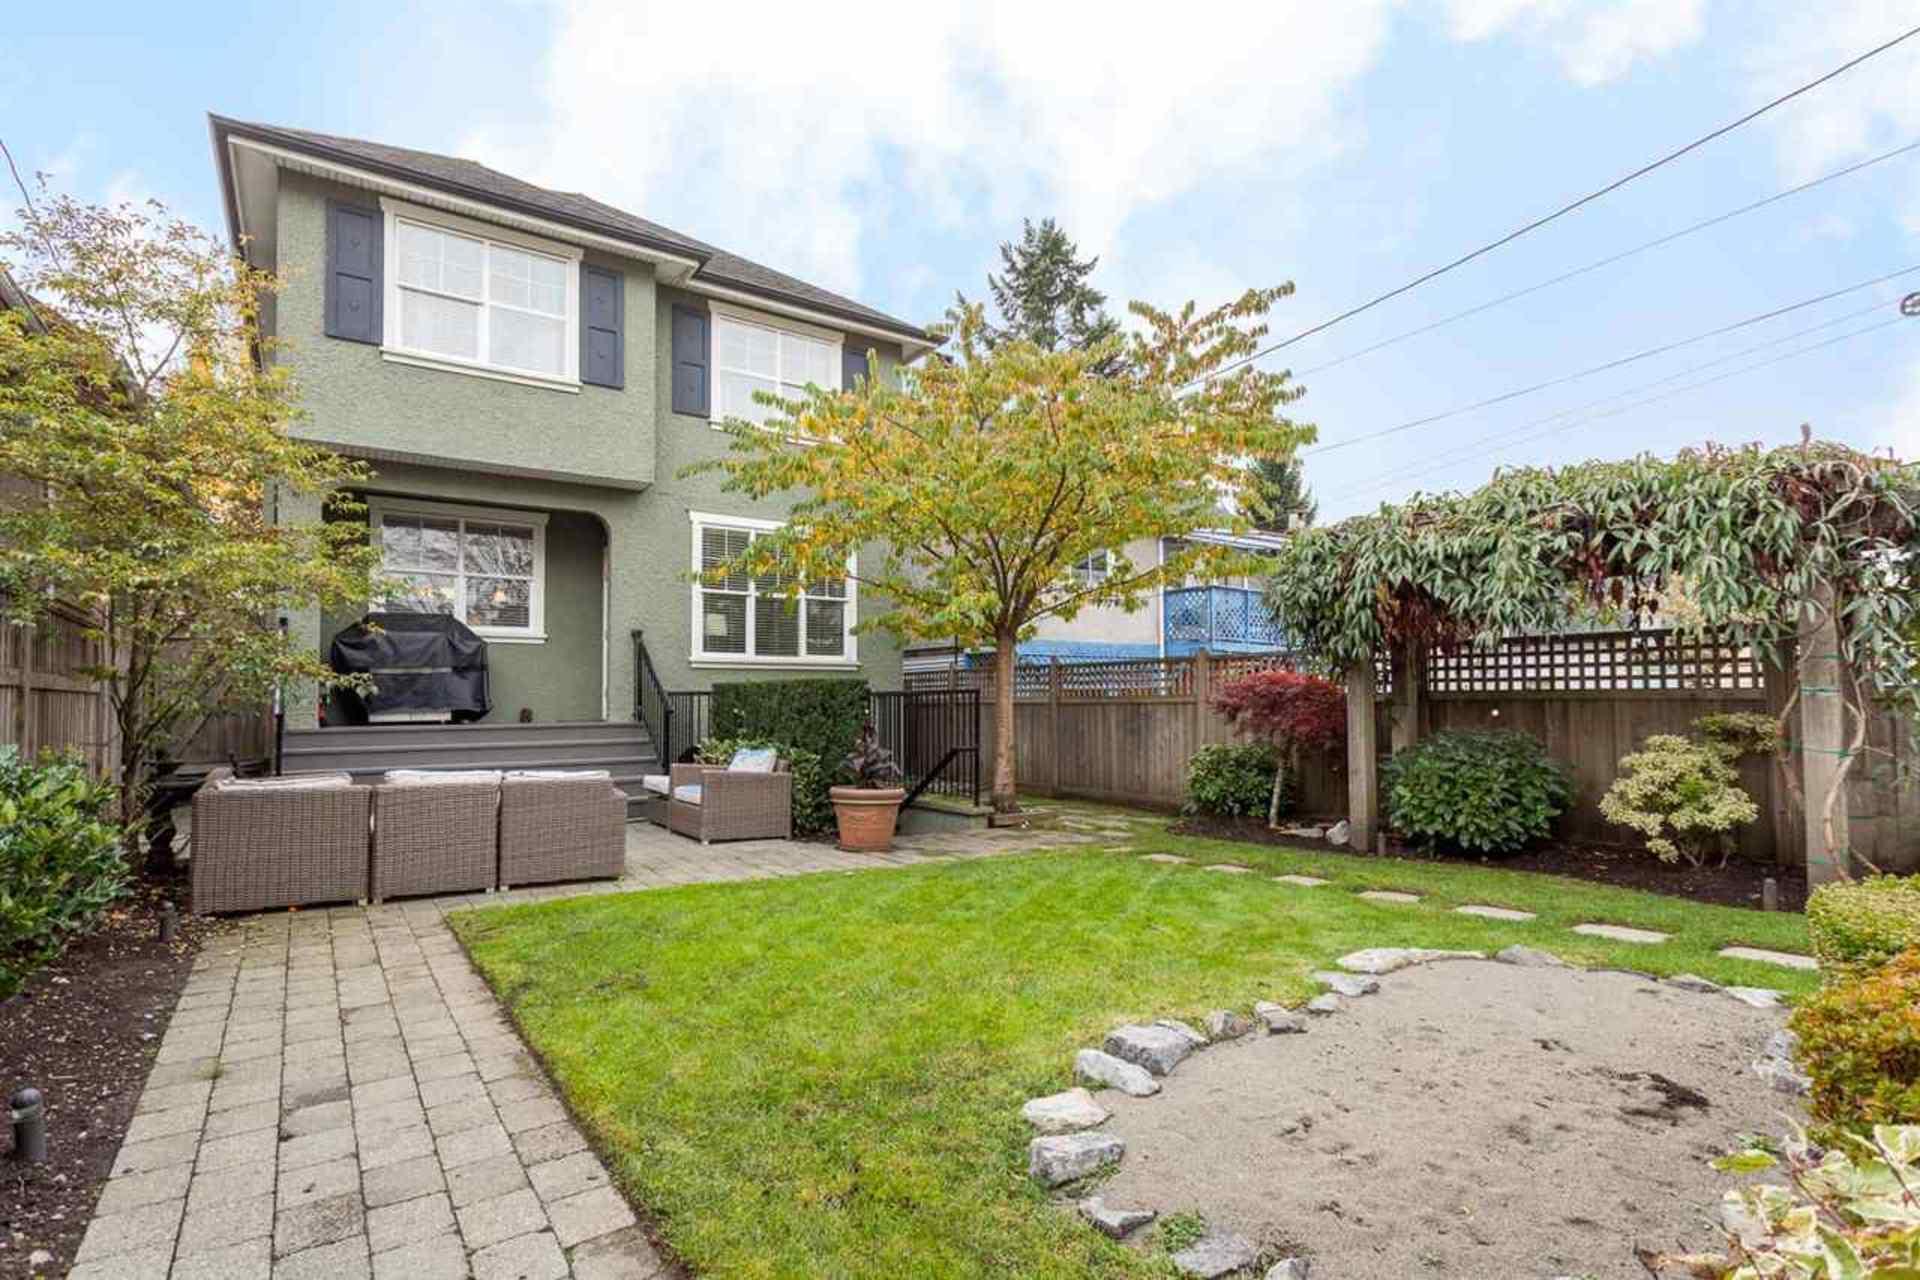 2455-cambridge-street-hastings-east-vancouver-east-20 at 2455 Cambridge Street, Hastings East, Vancouver East